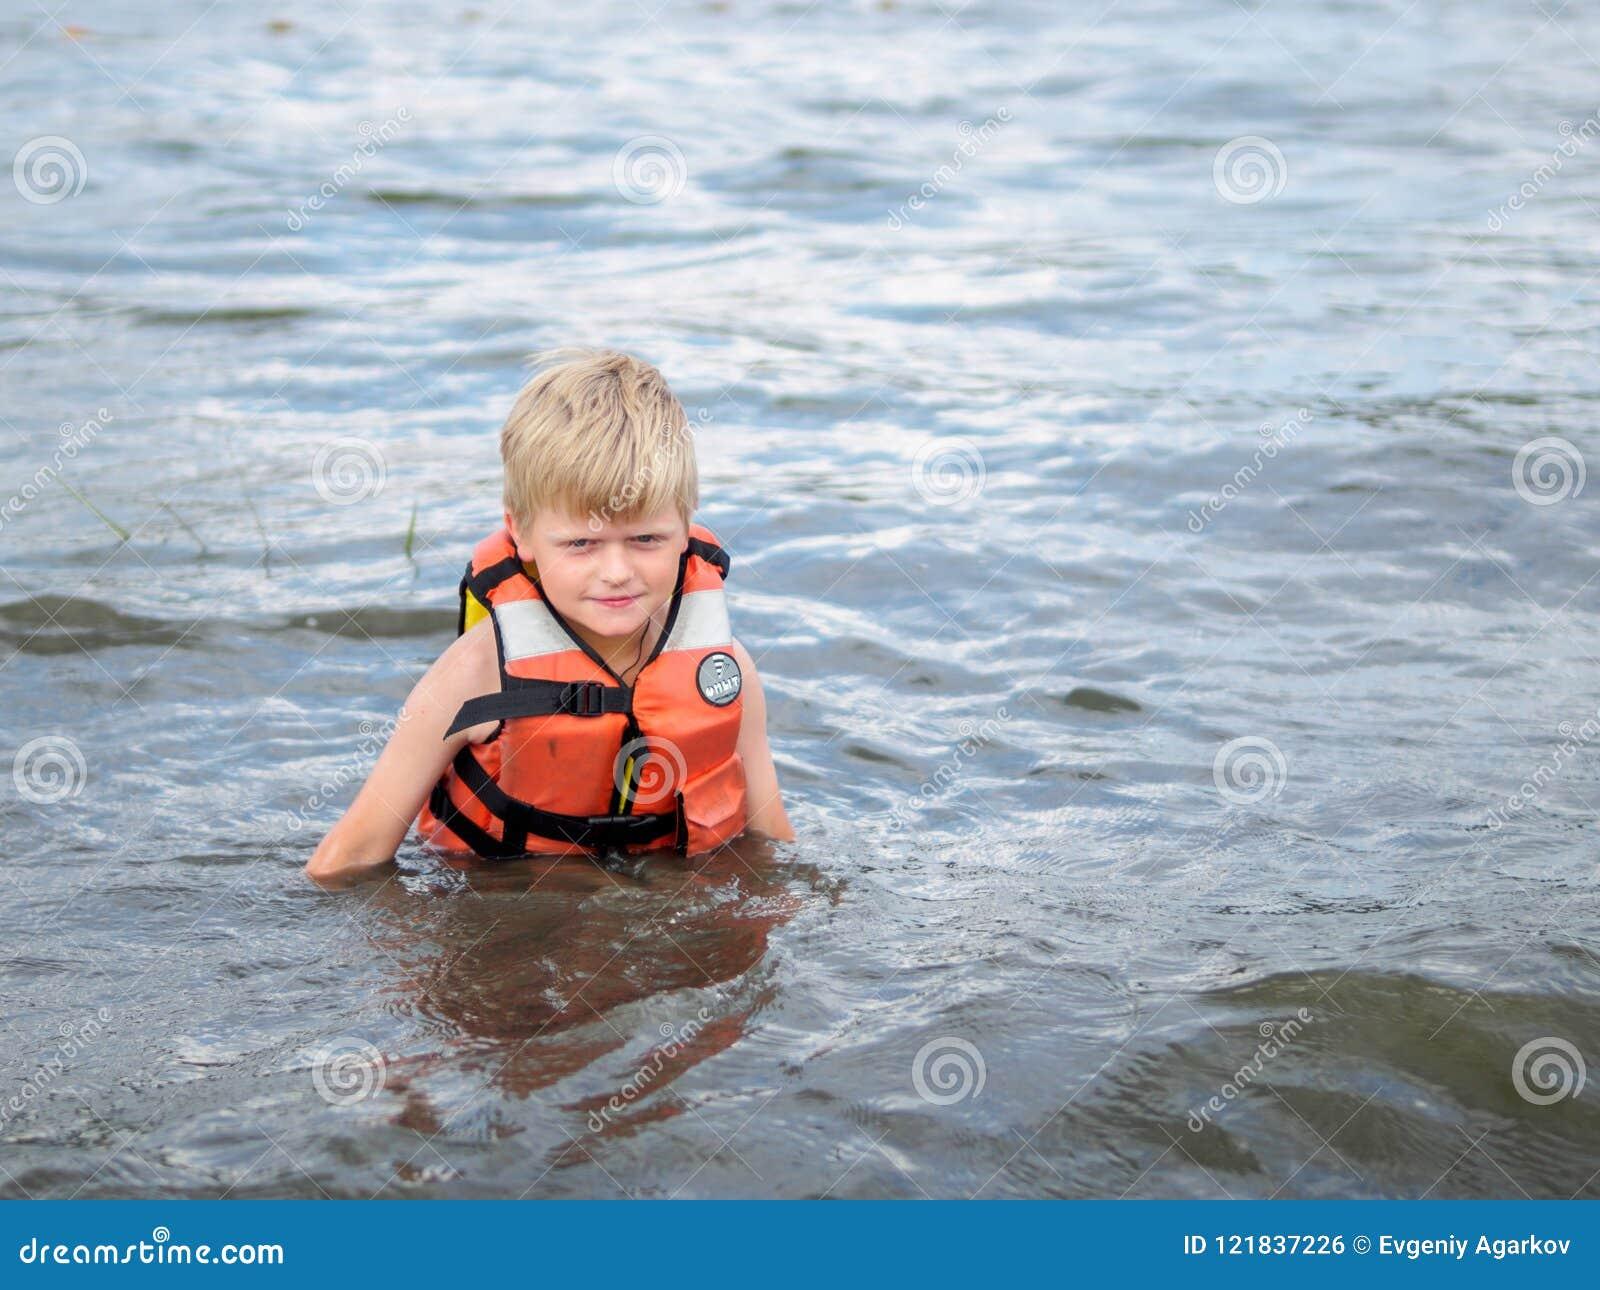 Cute little boy in orange life vest swimming in the river